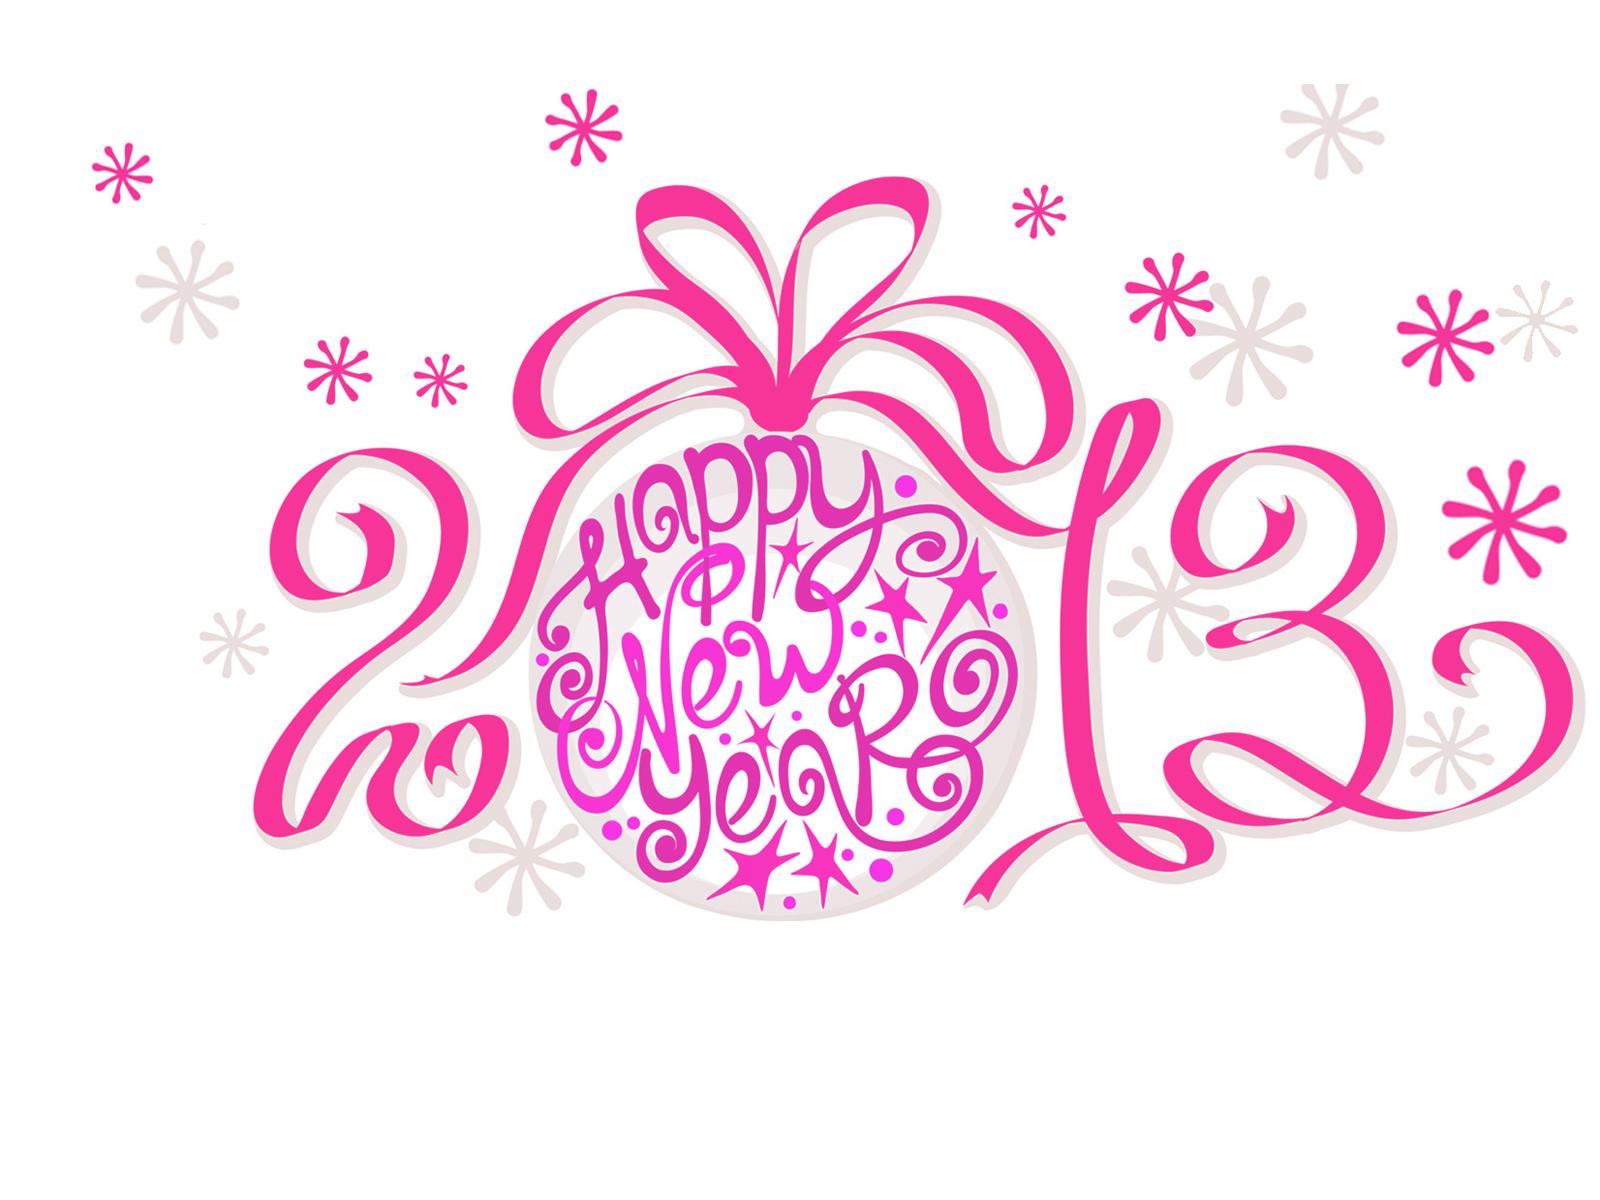 happy new year 2013 hd wallpaper 6